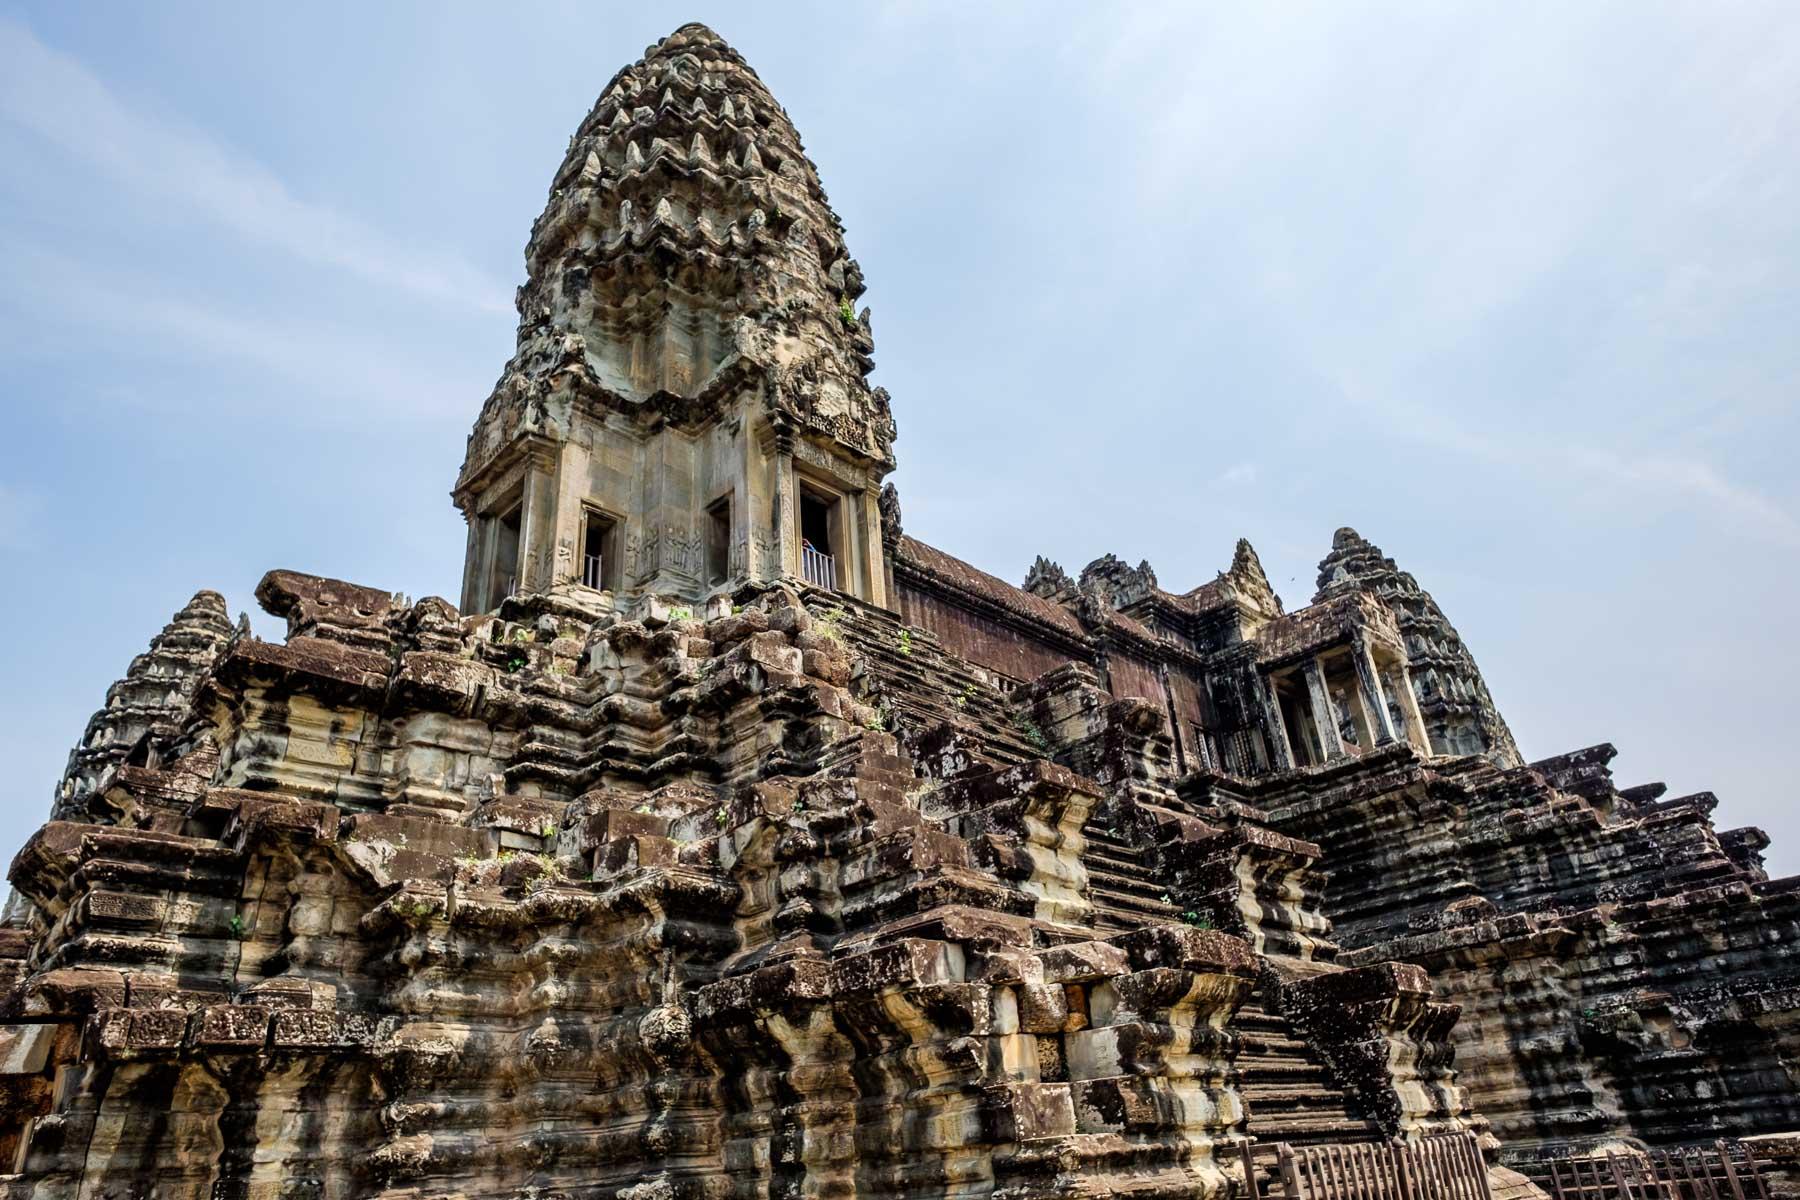 Tower Angkor Wat Siem Reap Cambodia